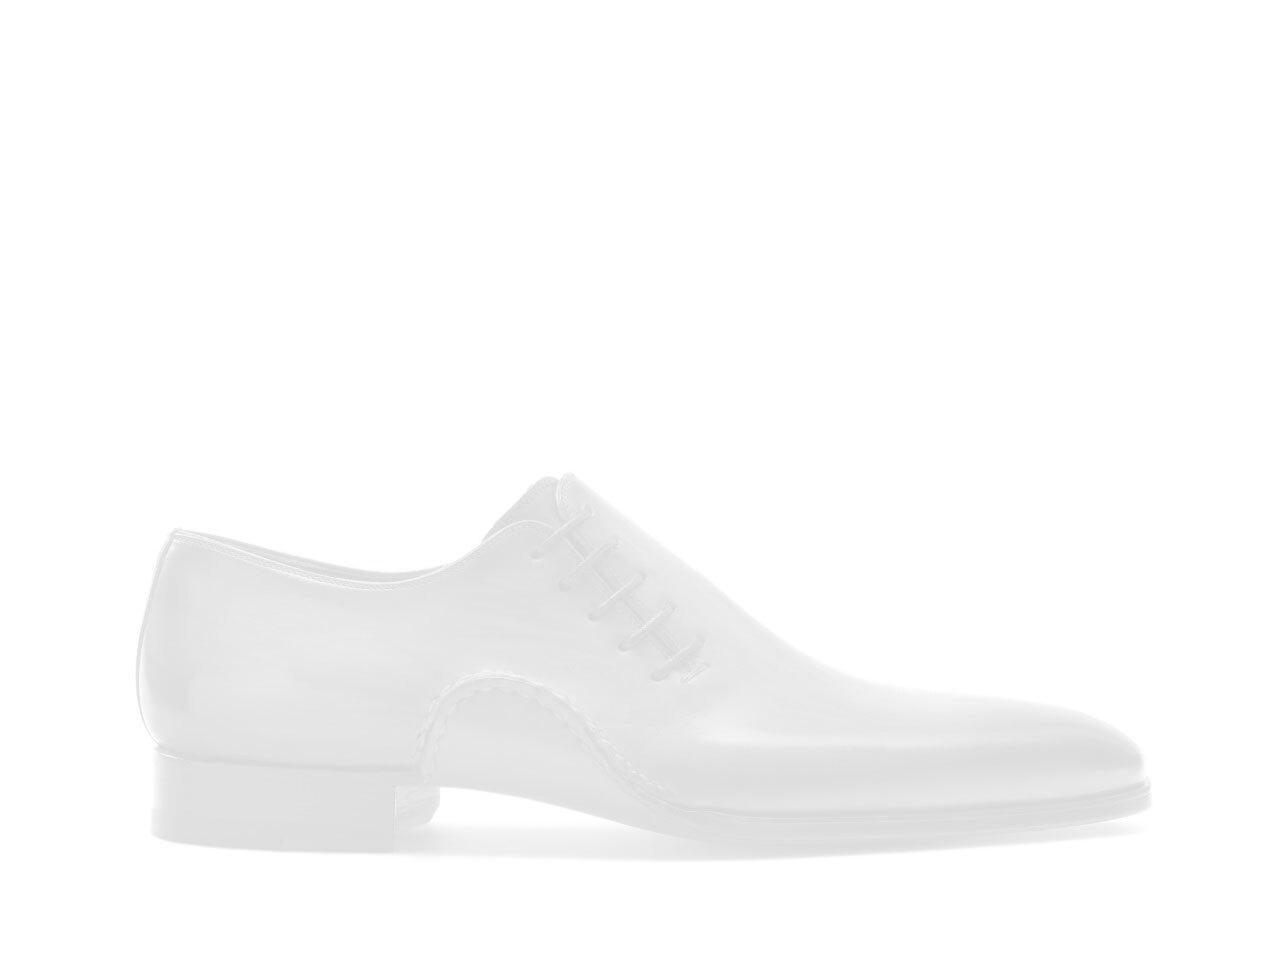 Pair of the Magnanni Zalamea Cuero Men's Oxford Shoes